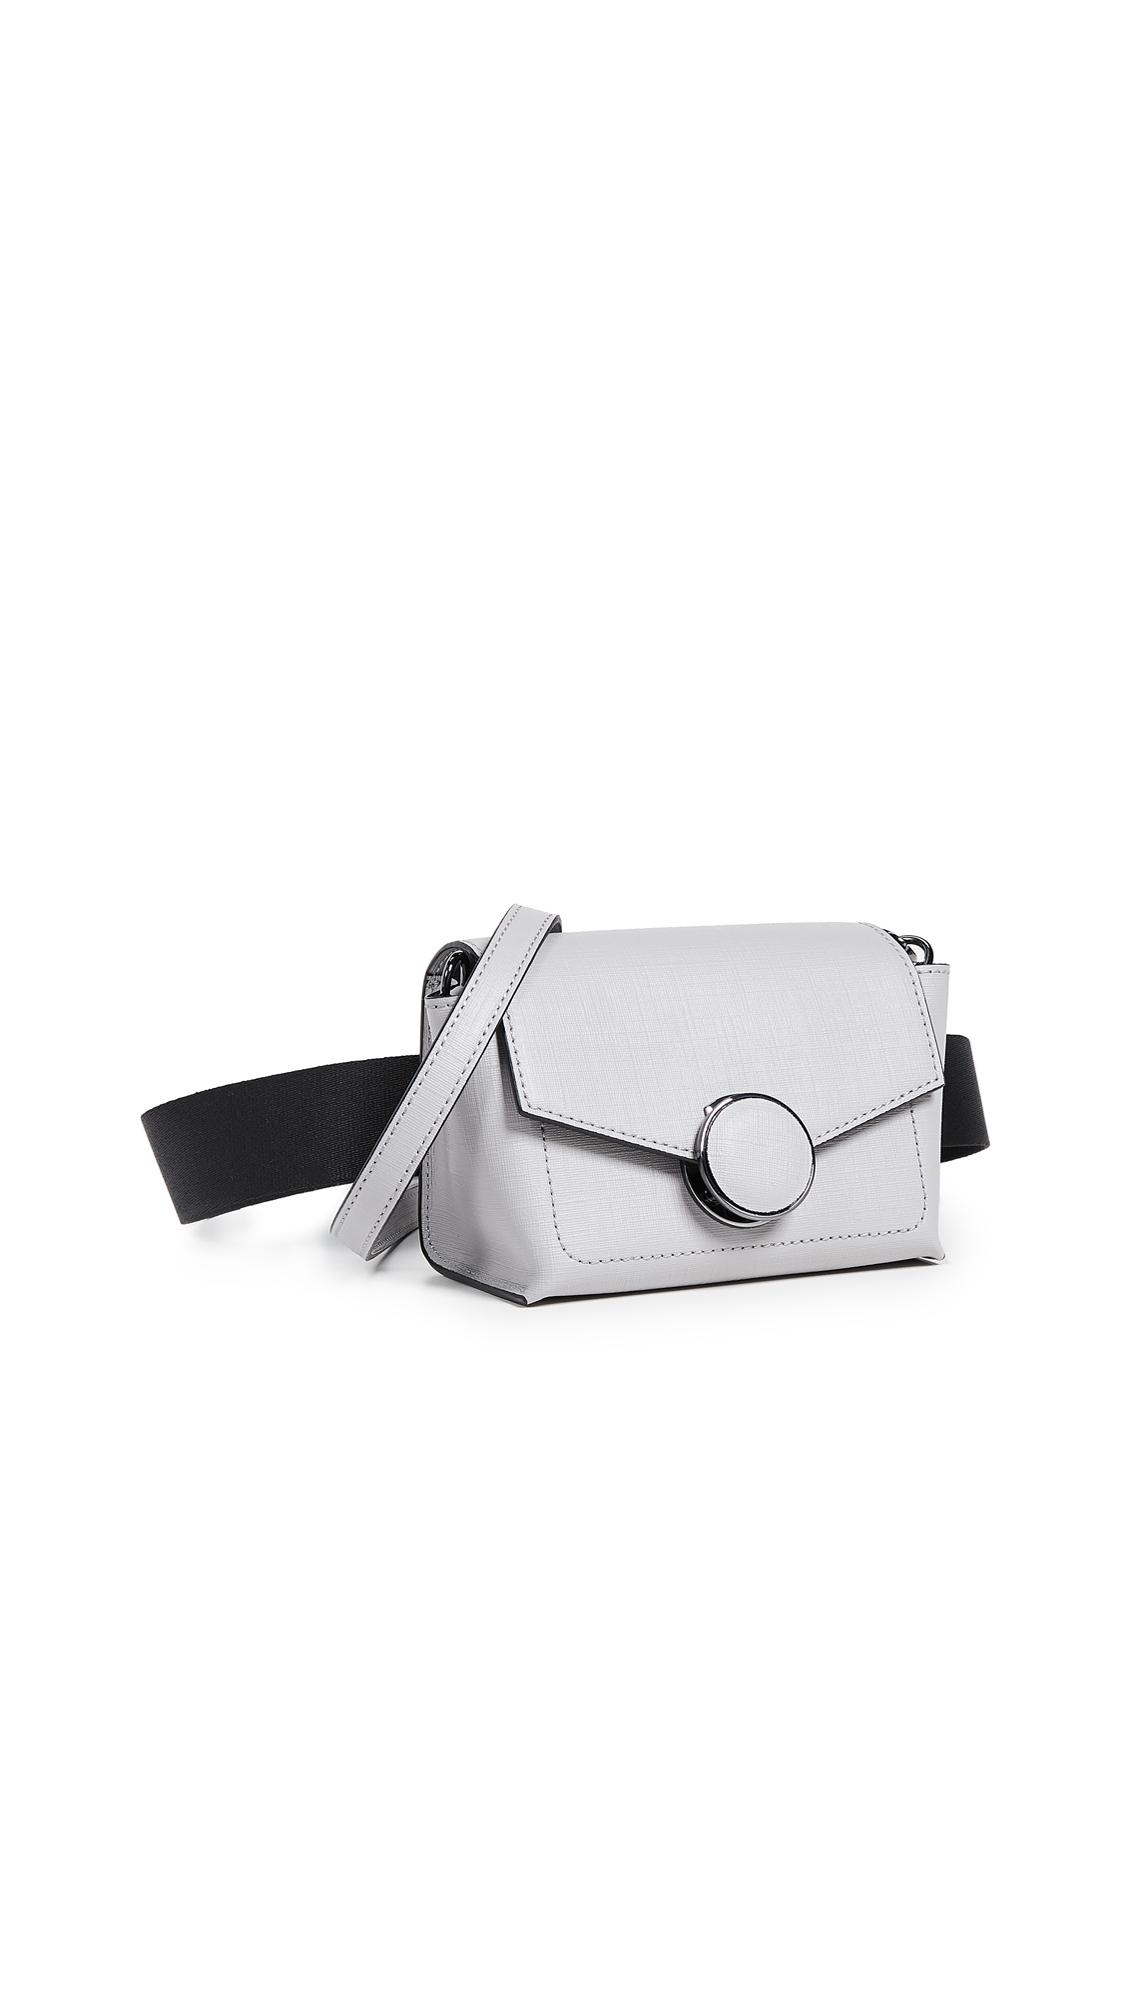 Nolita Belt Bag in Silver Grey